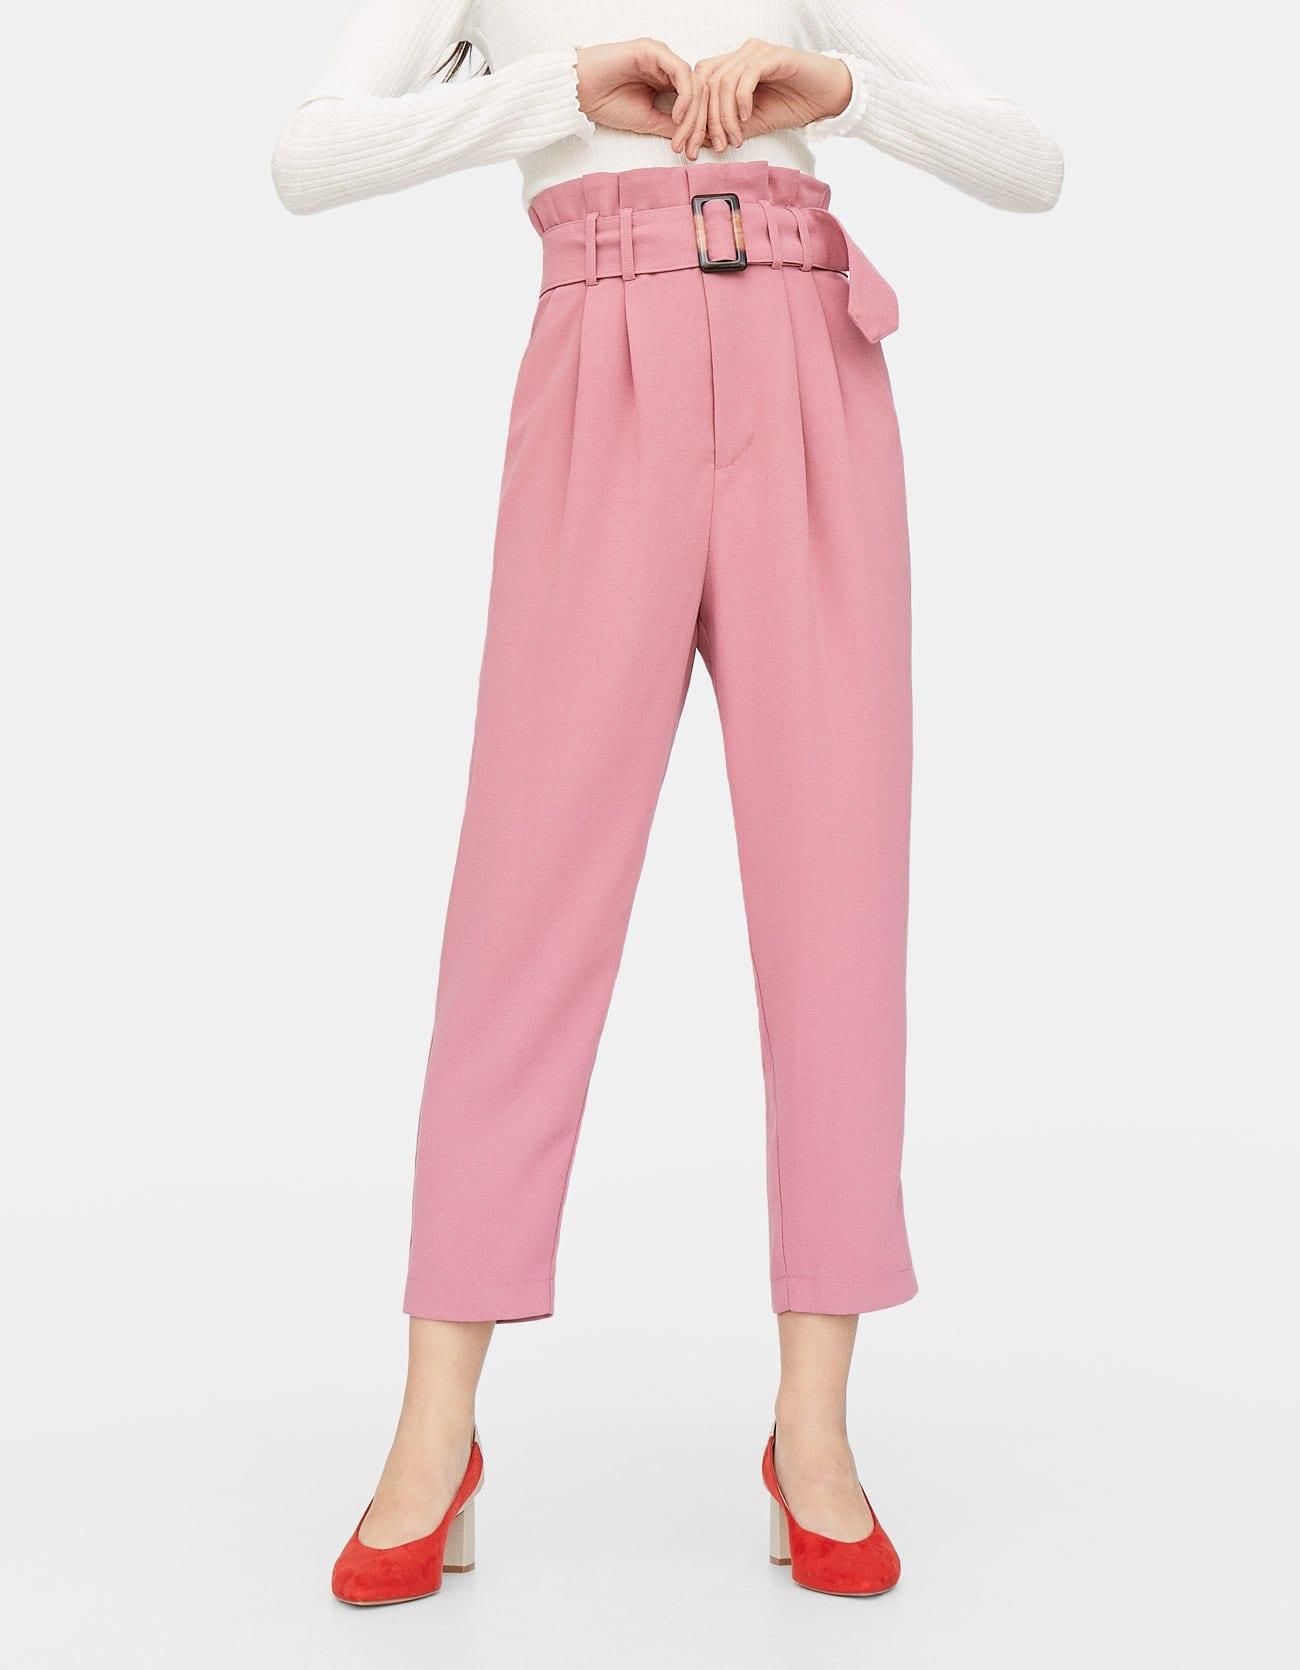 Pantaloni rosa con vita paper bag a 29,99 euro